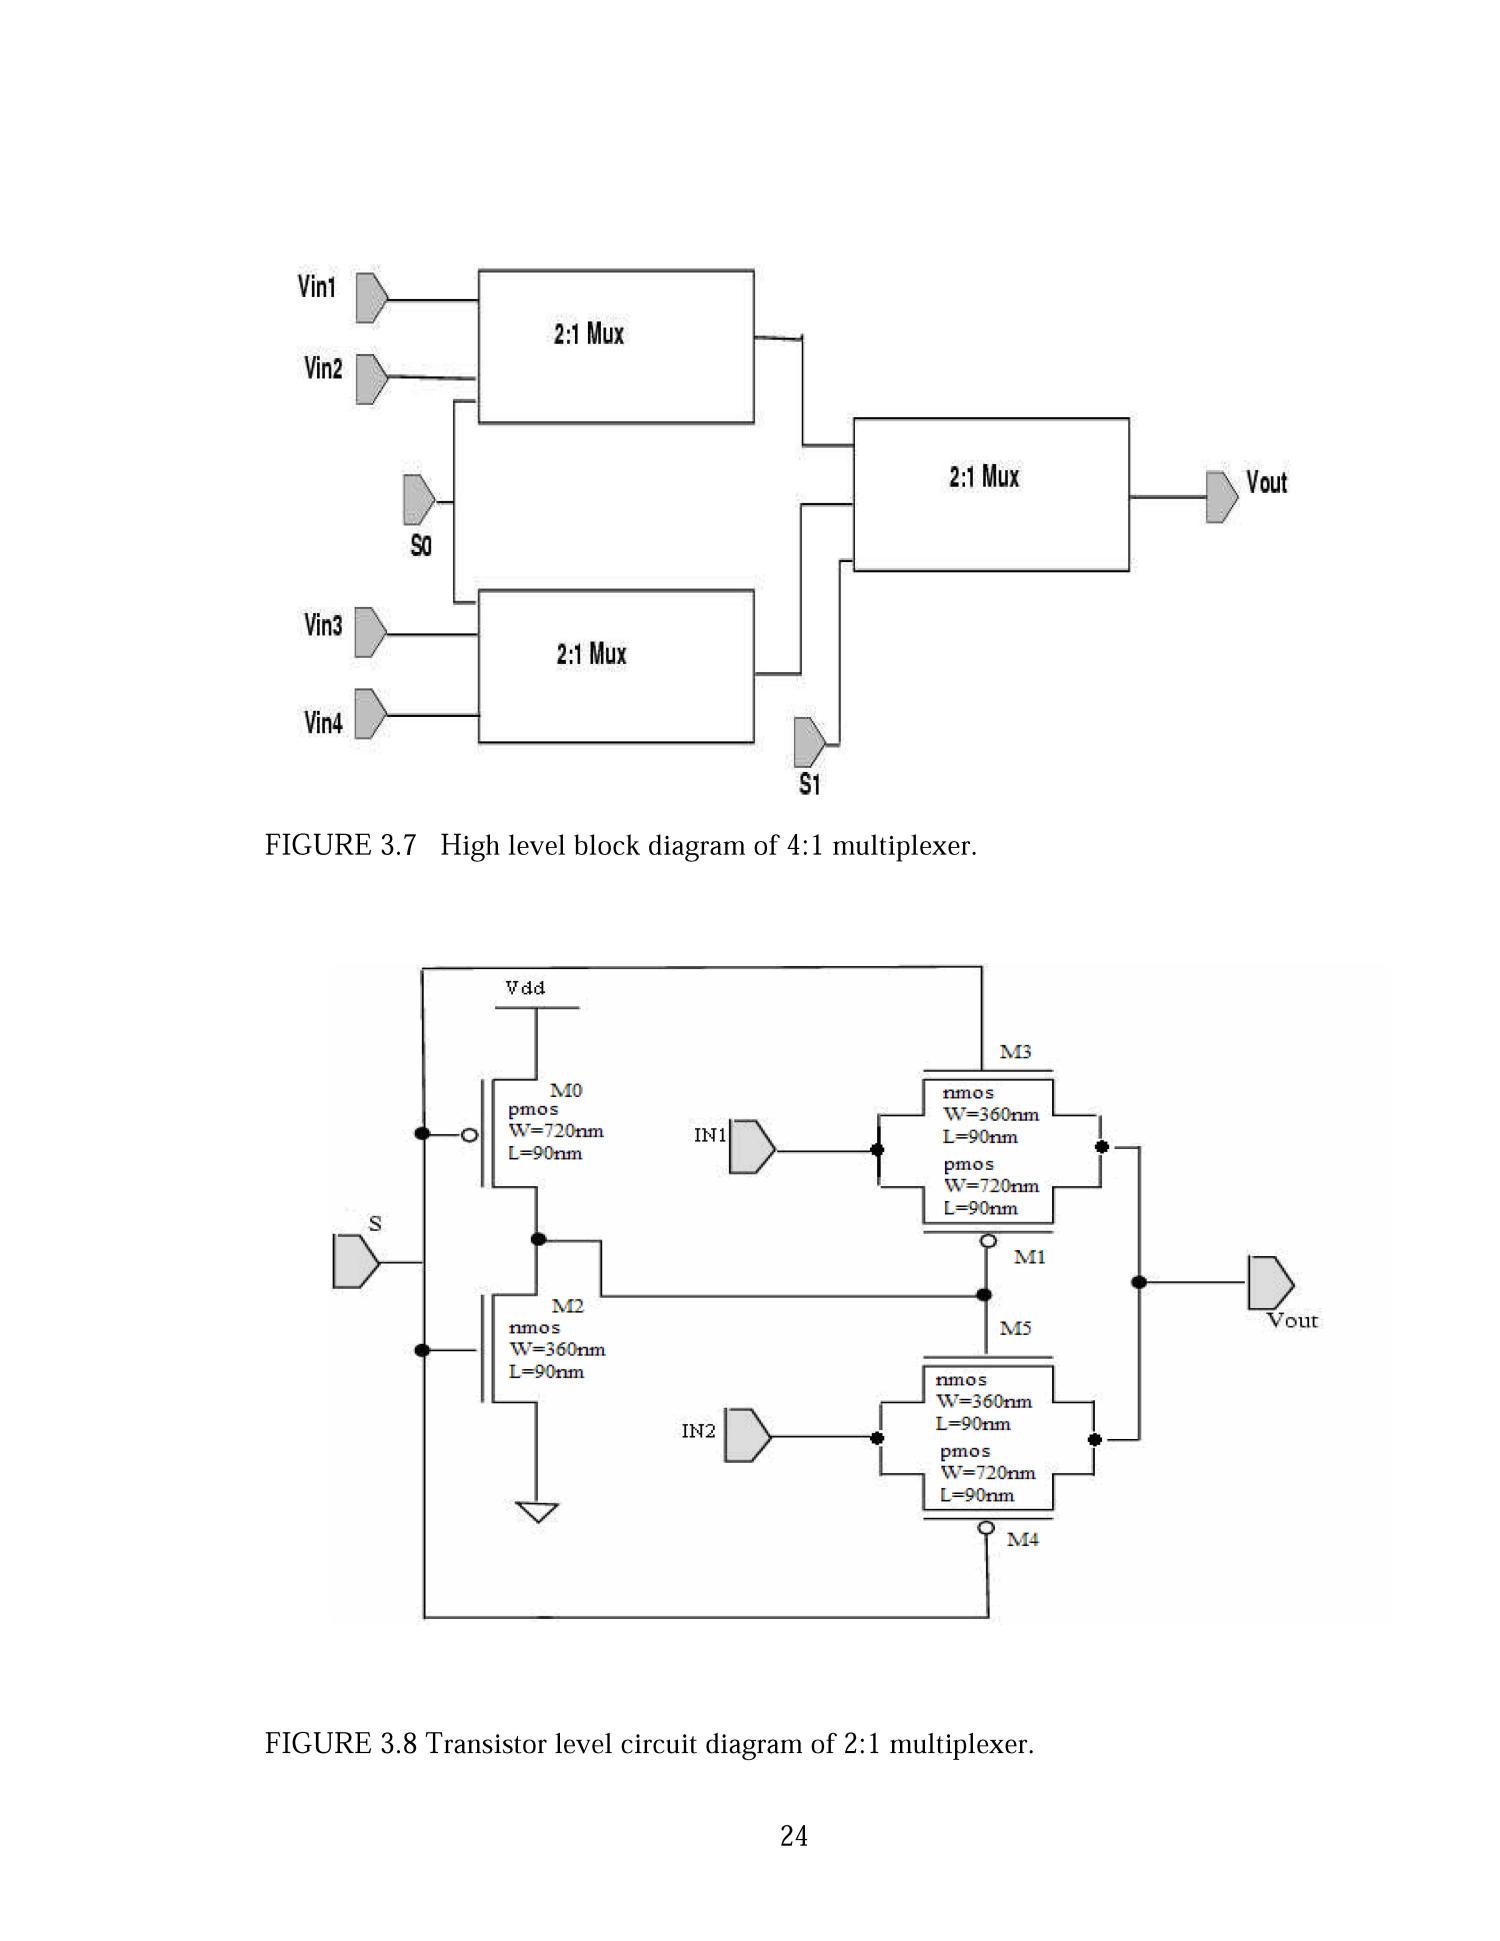 A Nano Cmos Based Universal Voltage Level Converter For Multi Vdd 1 Block Diagram Socs